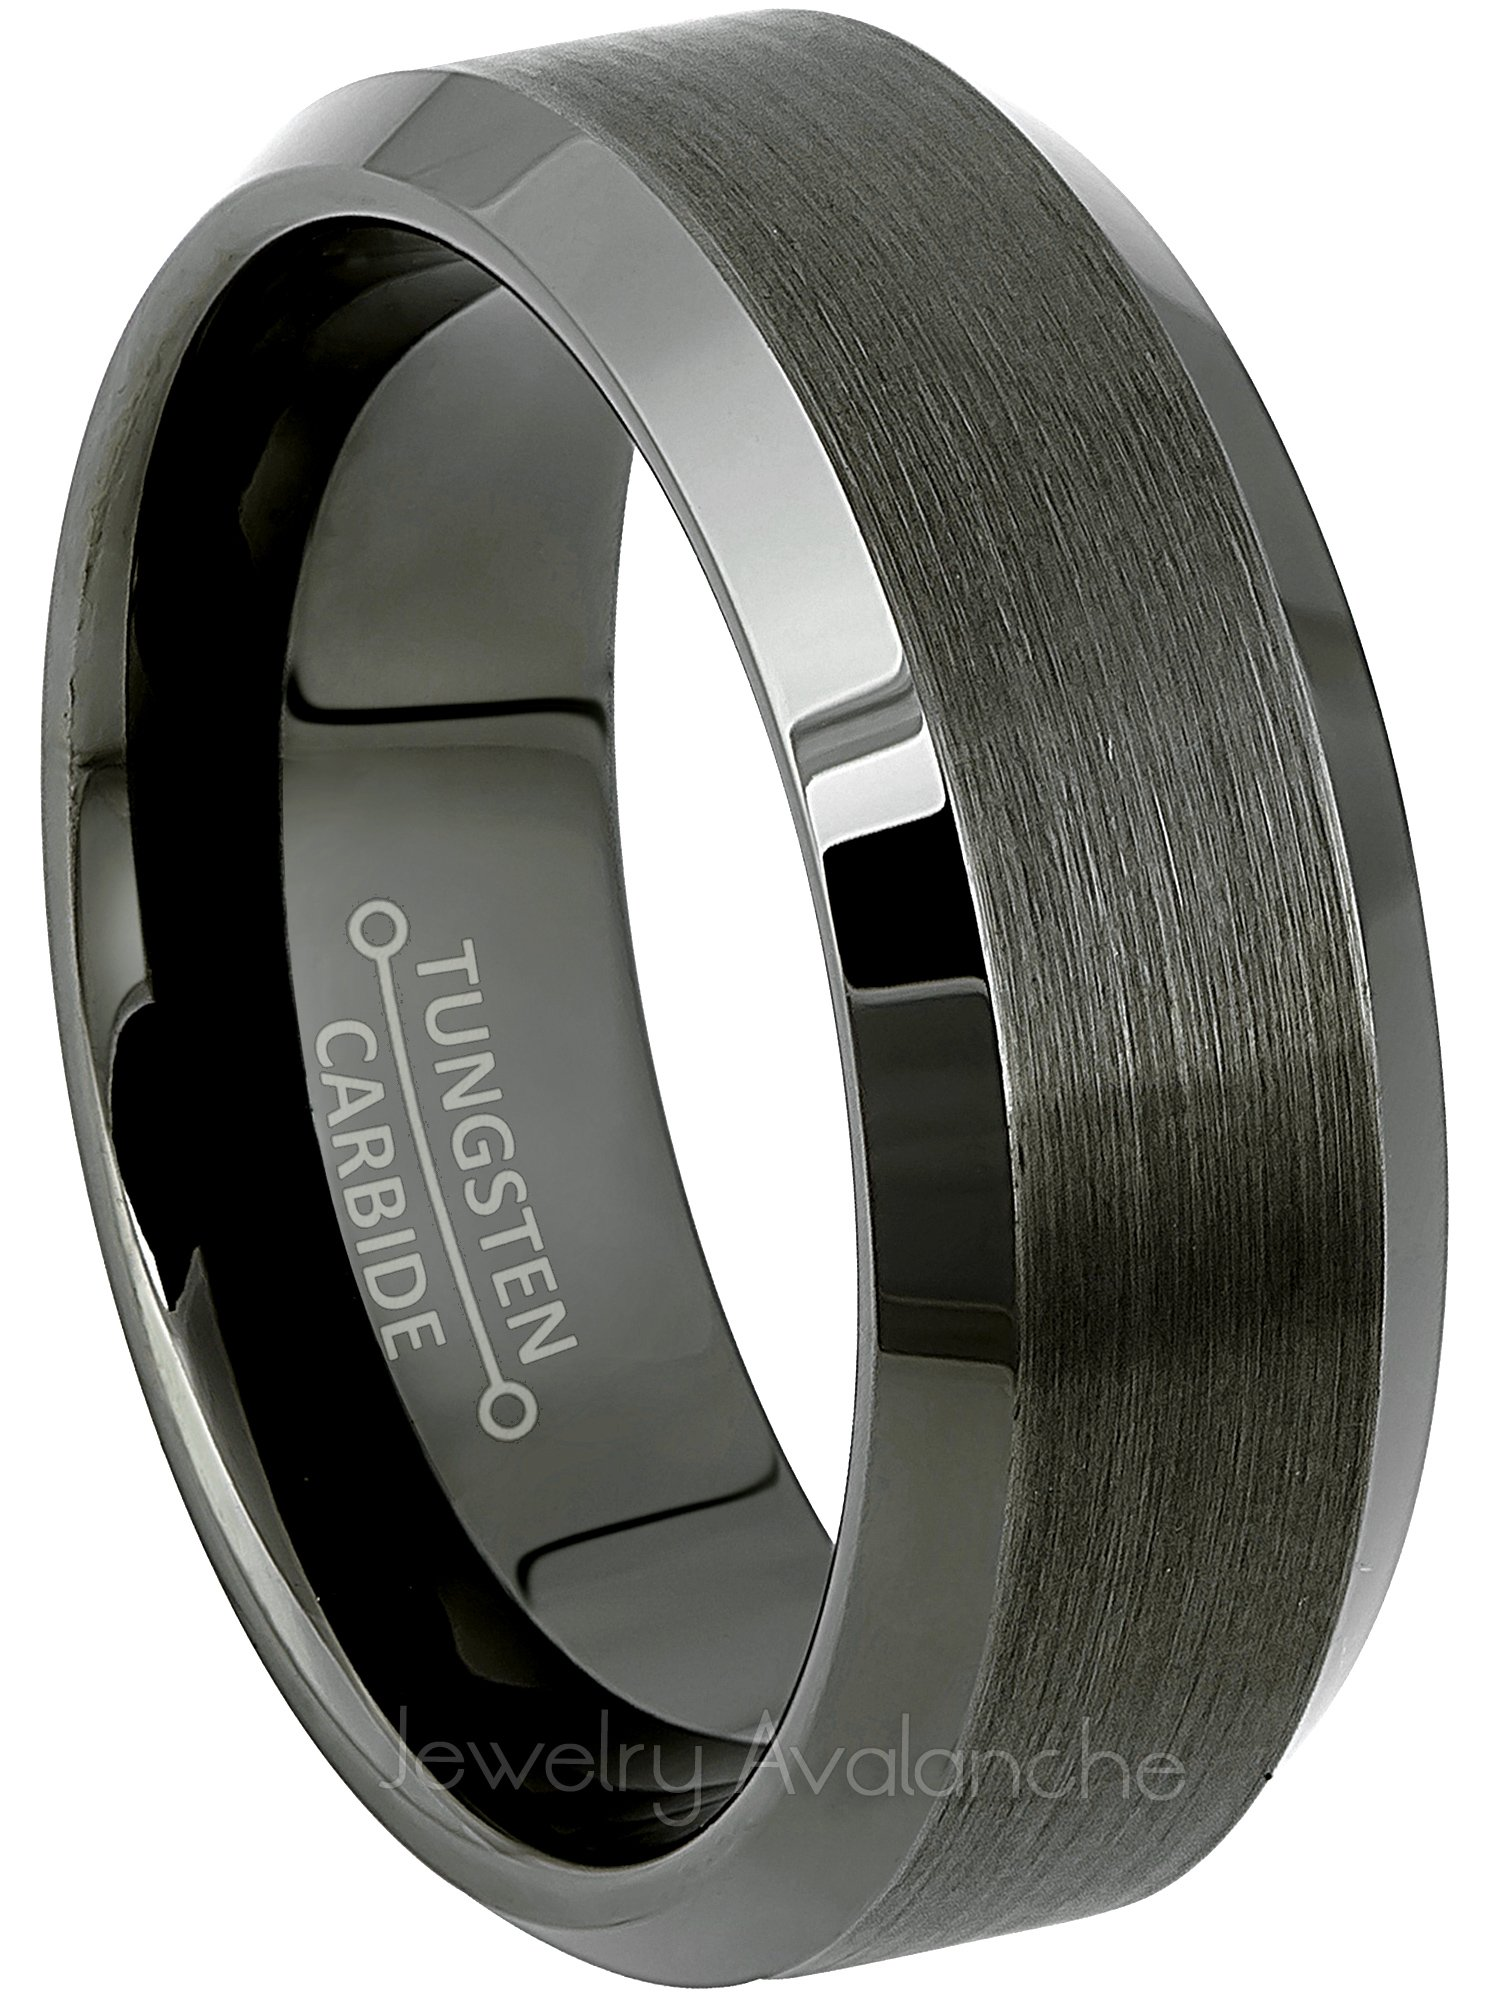 Jewelry Avalanche Beveled Gunmetal Tungsten Ring - Men's Tungsten Carbide Wedding Band - Anniversary Band - s9.5